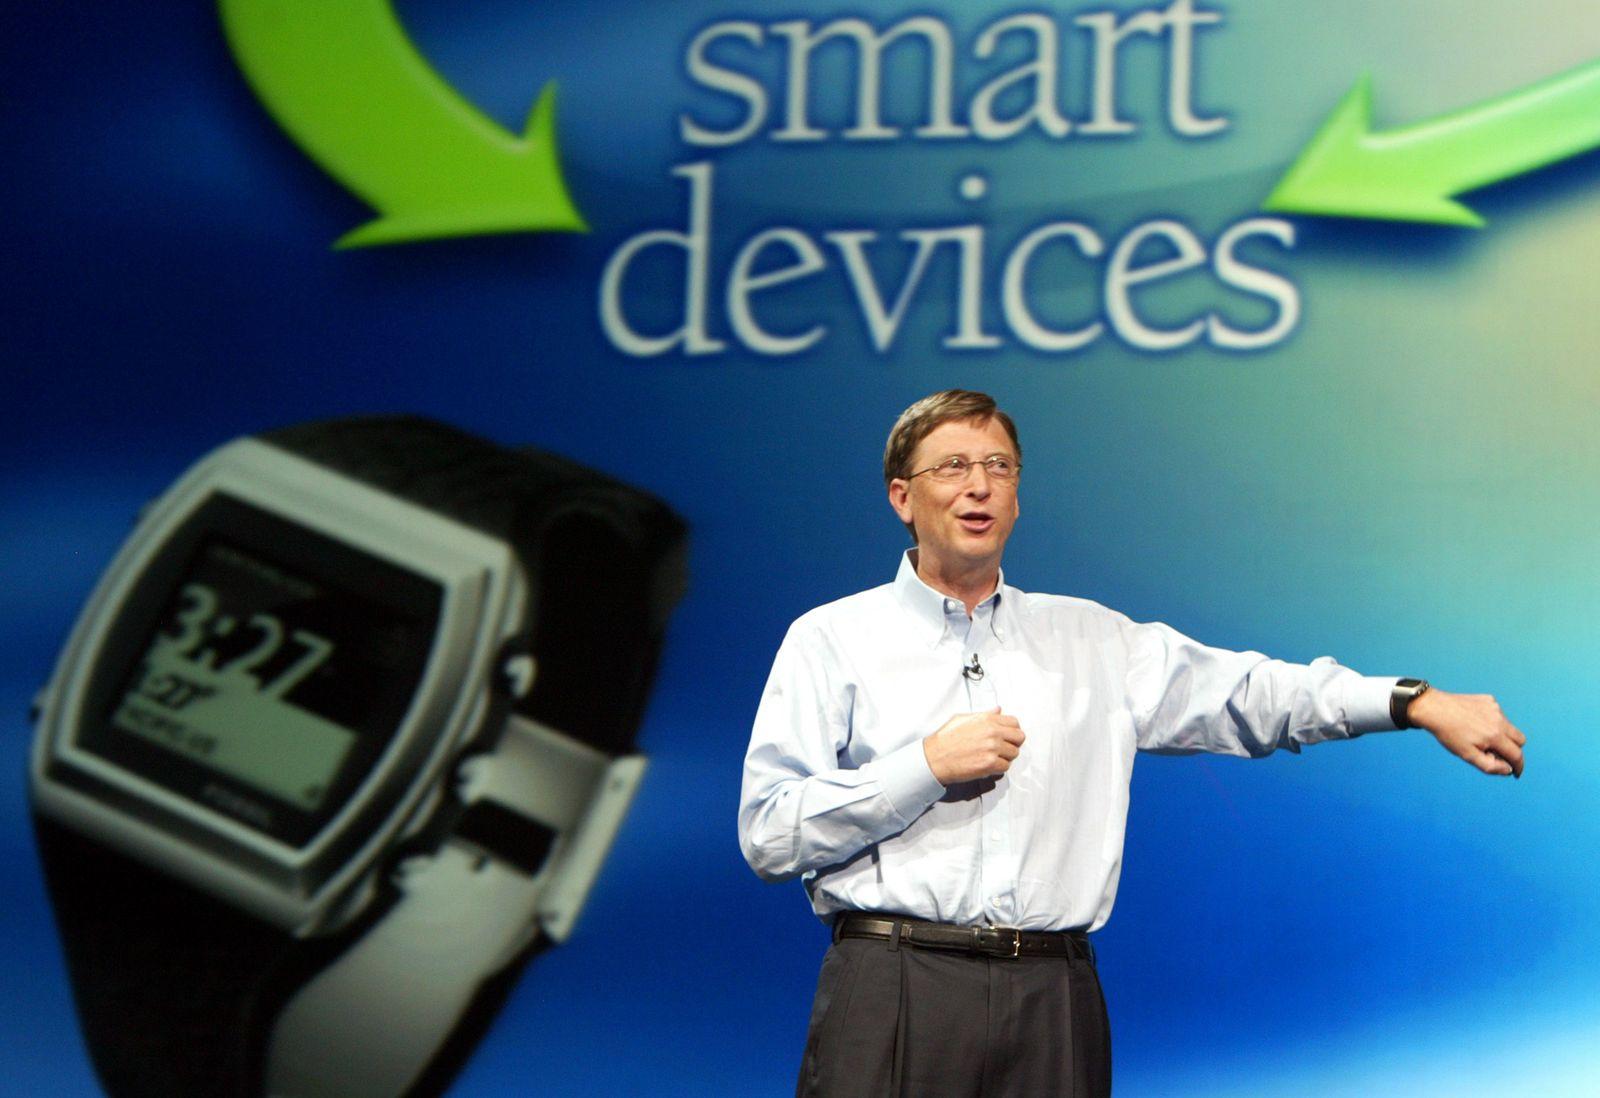 SmartWatch / Bill Gates / Fossil SPOT